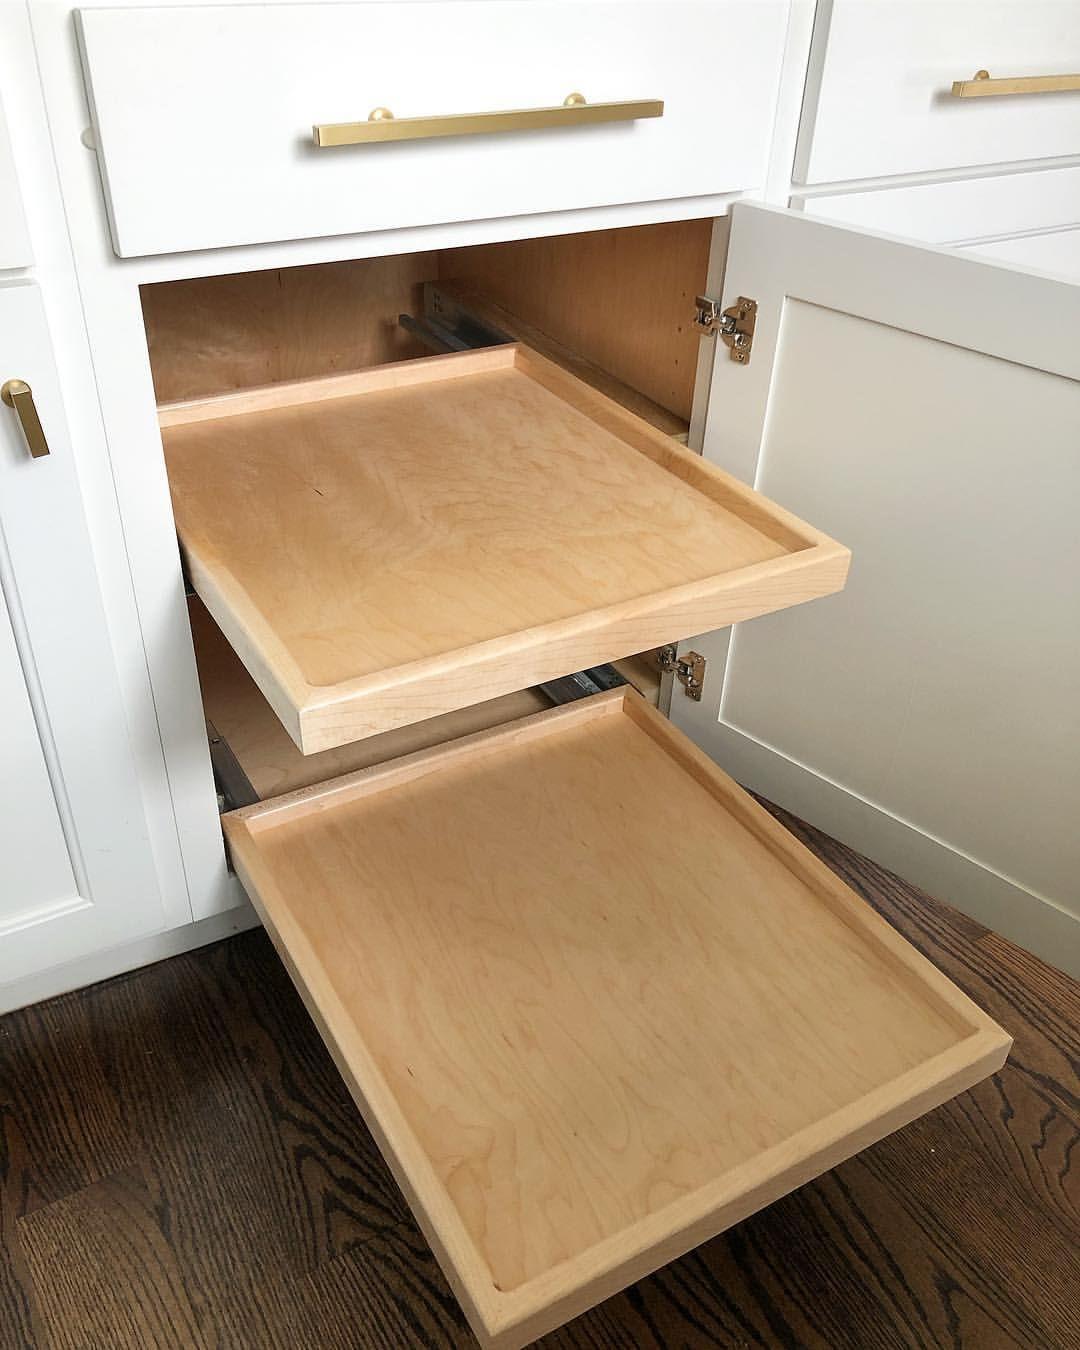 Soft Close Shelf Slides Best Kitchen Cabinets New Kitchen Cabinets Building Kitchen Cabinets